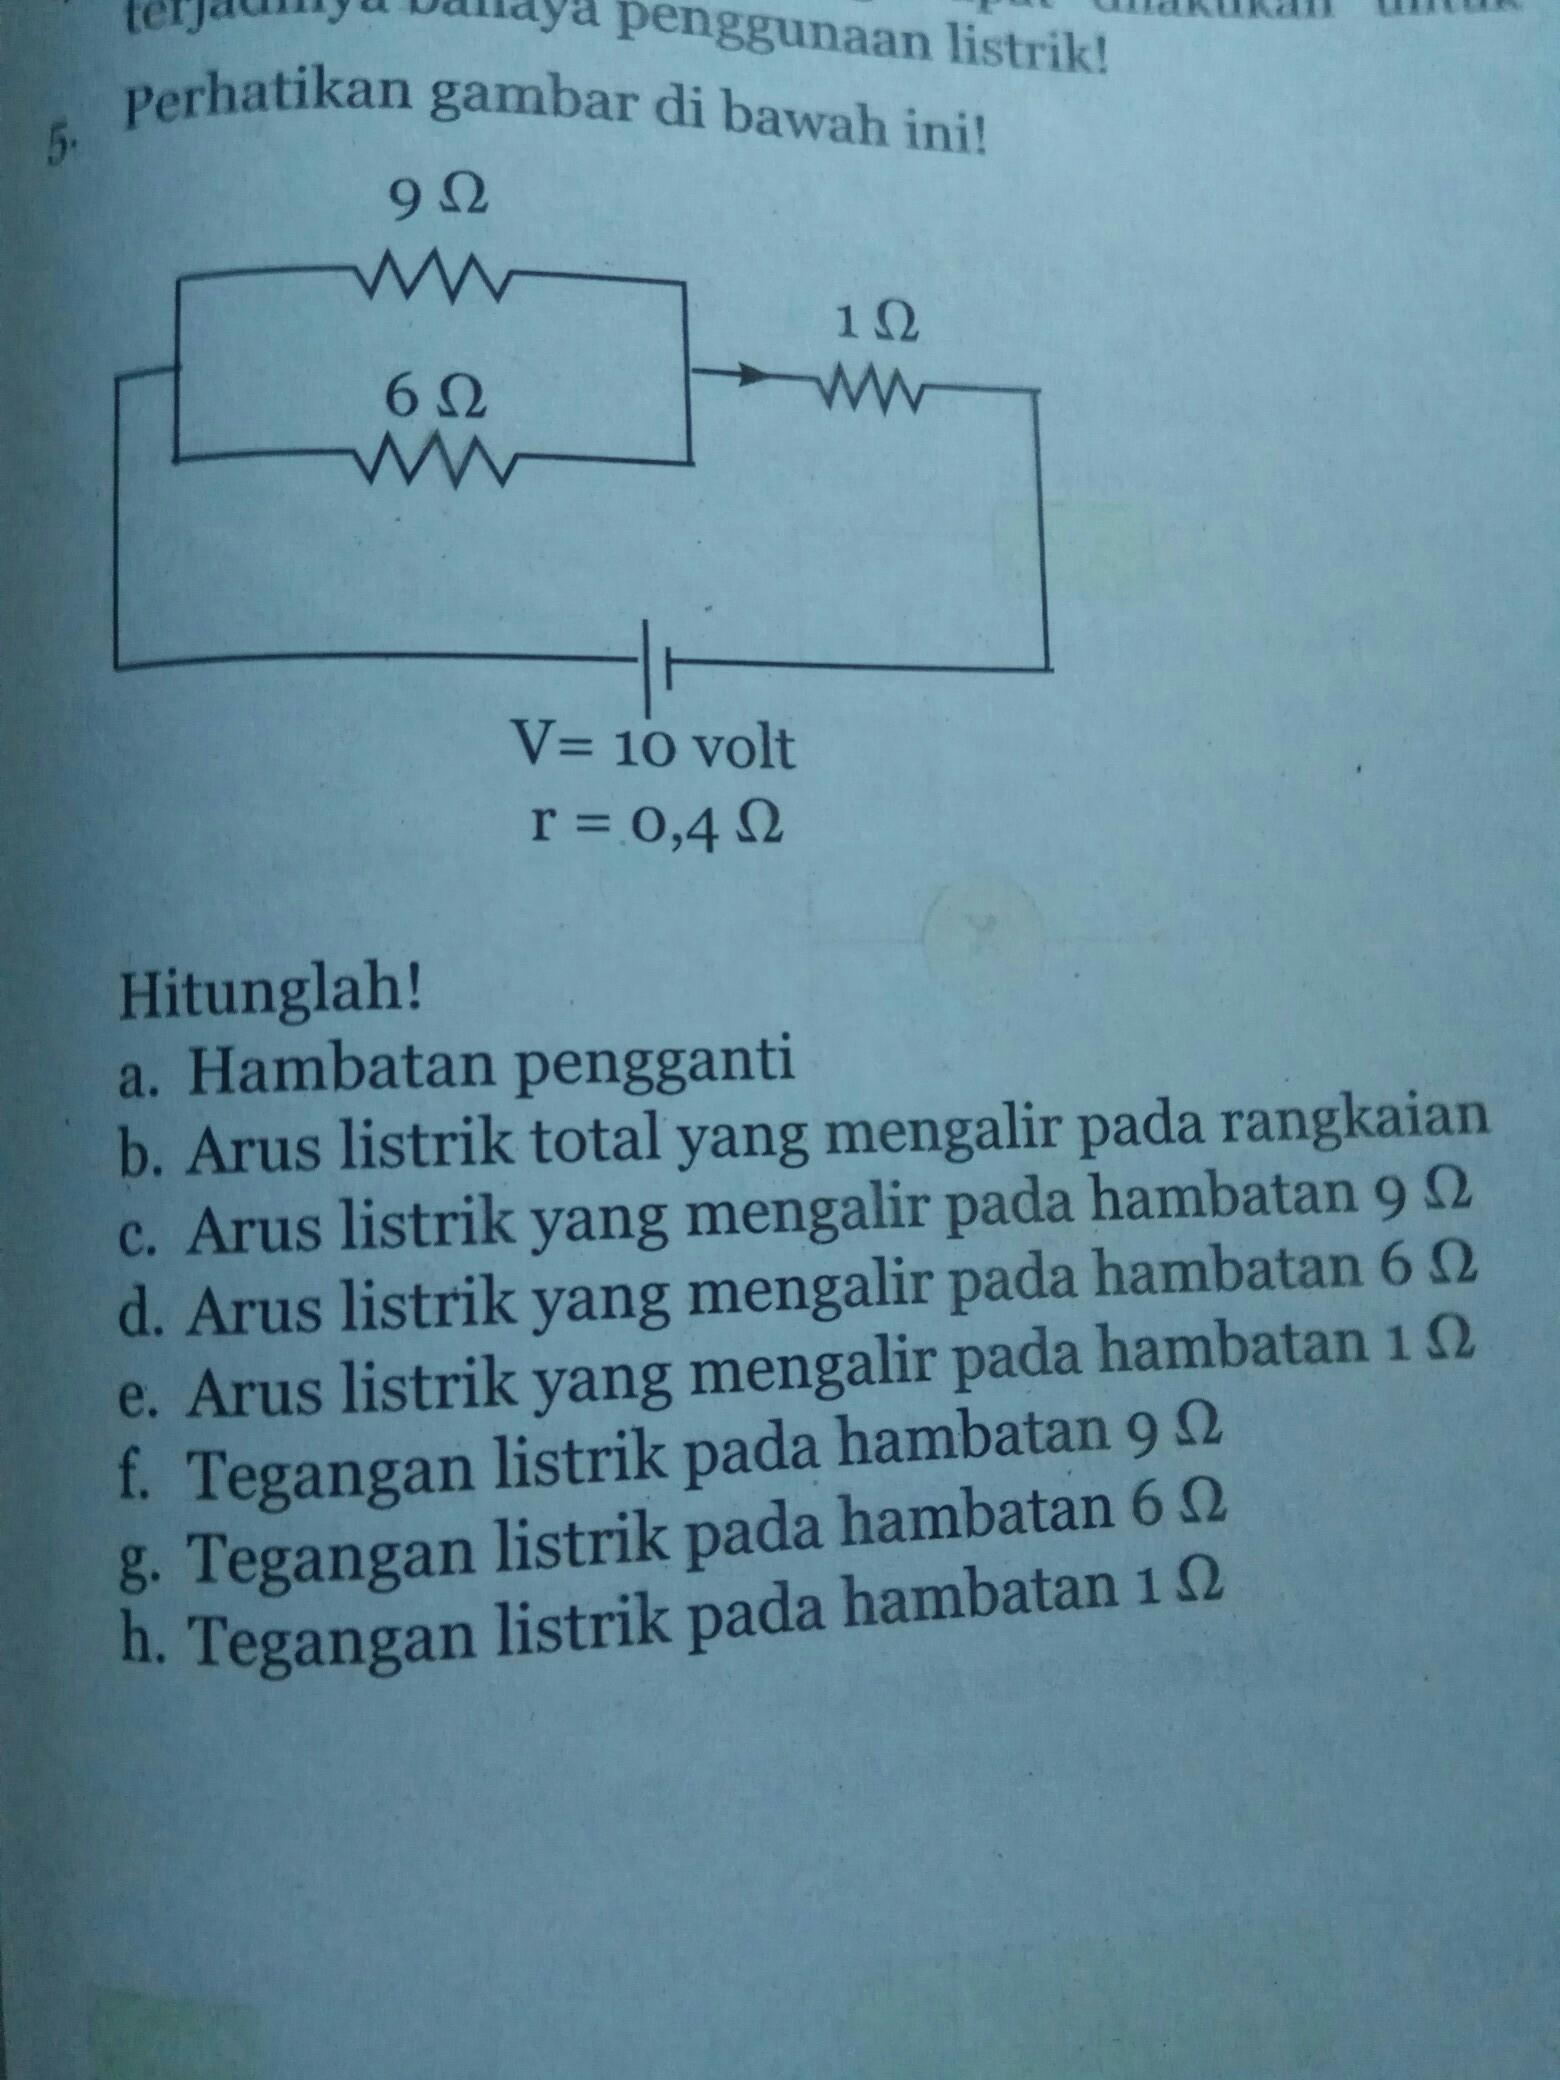 Kunci Jawaban Ipa Kelas 9 Semester 1 Kurikulum 2013 Halaman 241 Gudang Kunci